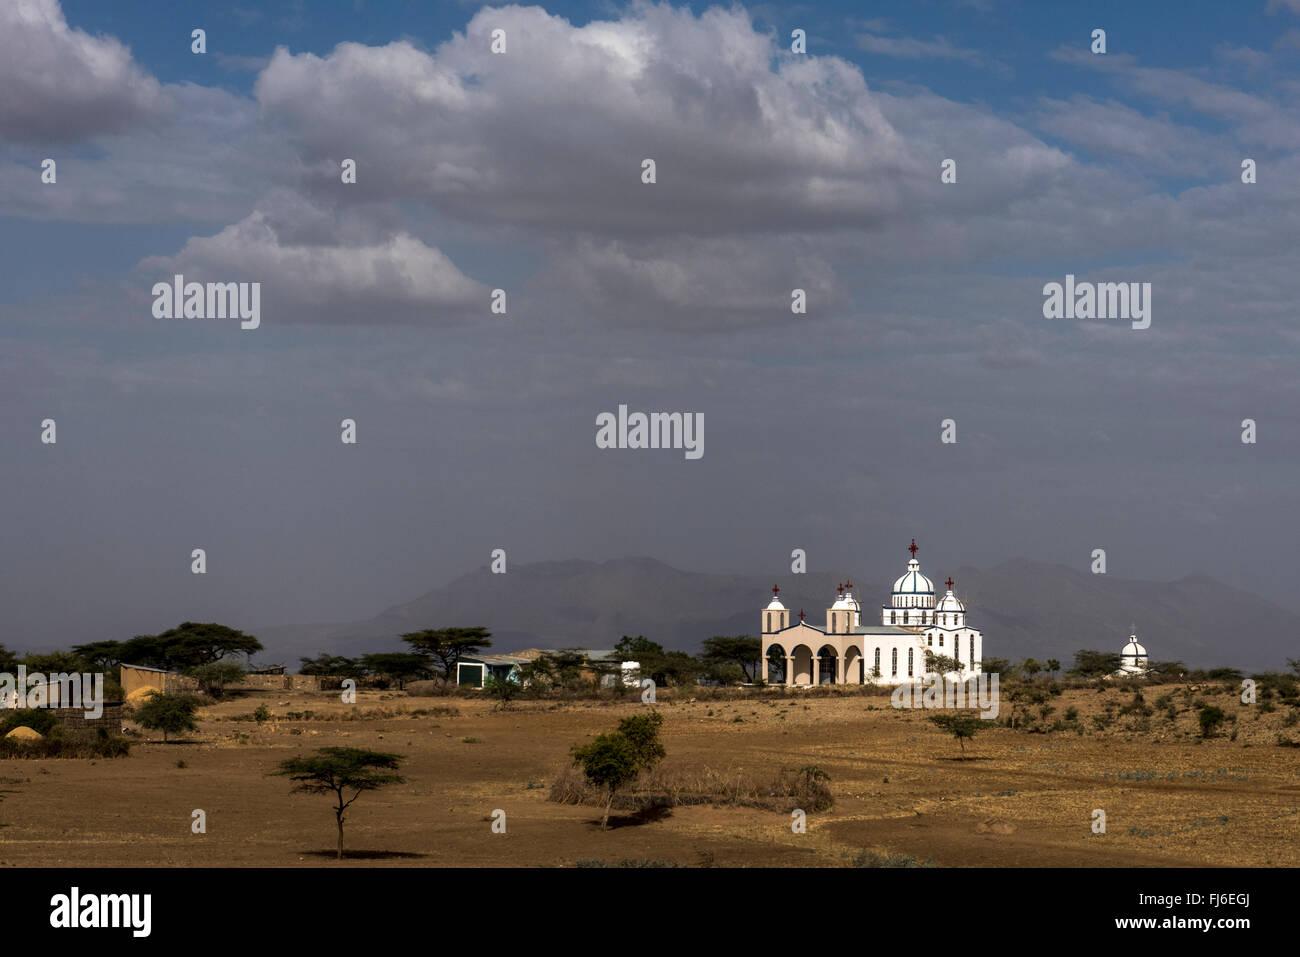 Orthodox Church, Ethiopia, Africa - Stock Image